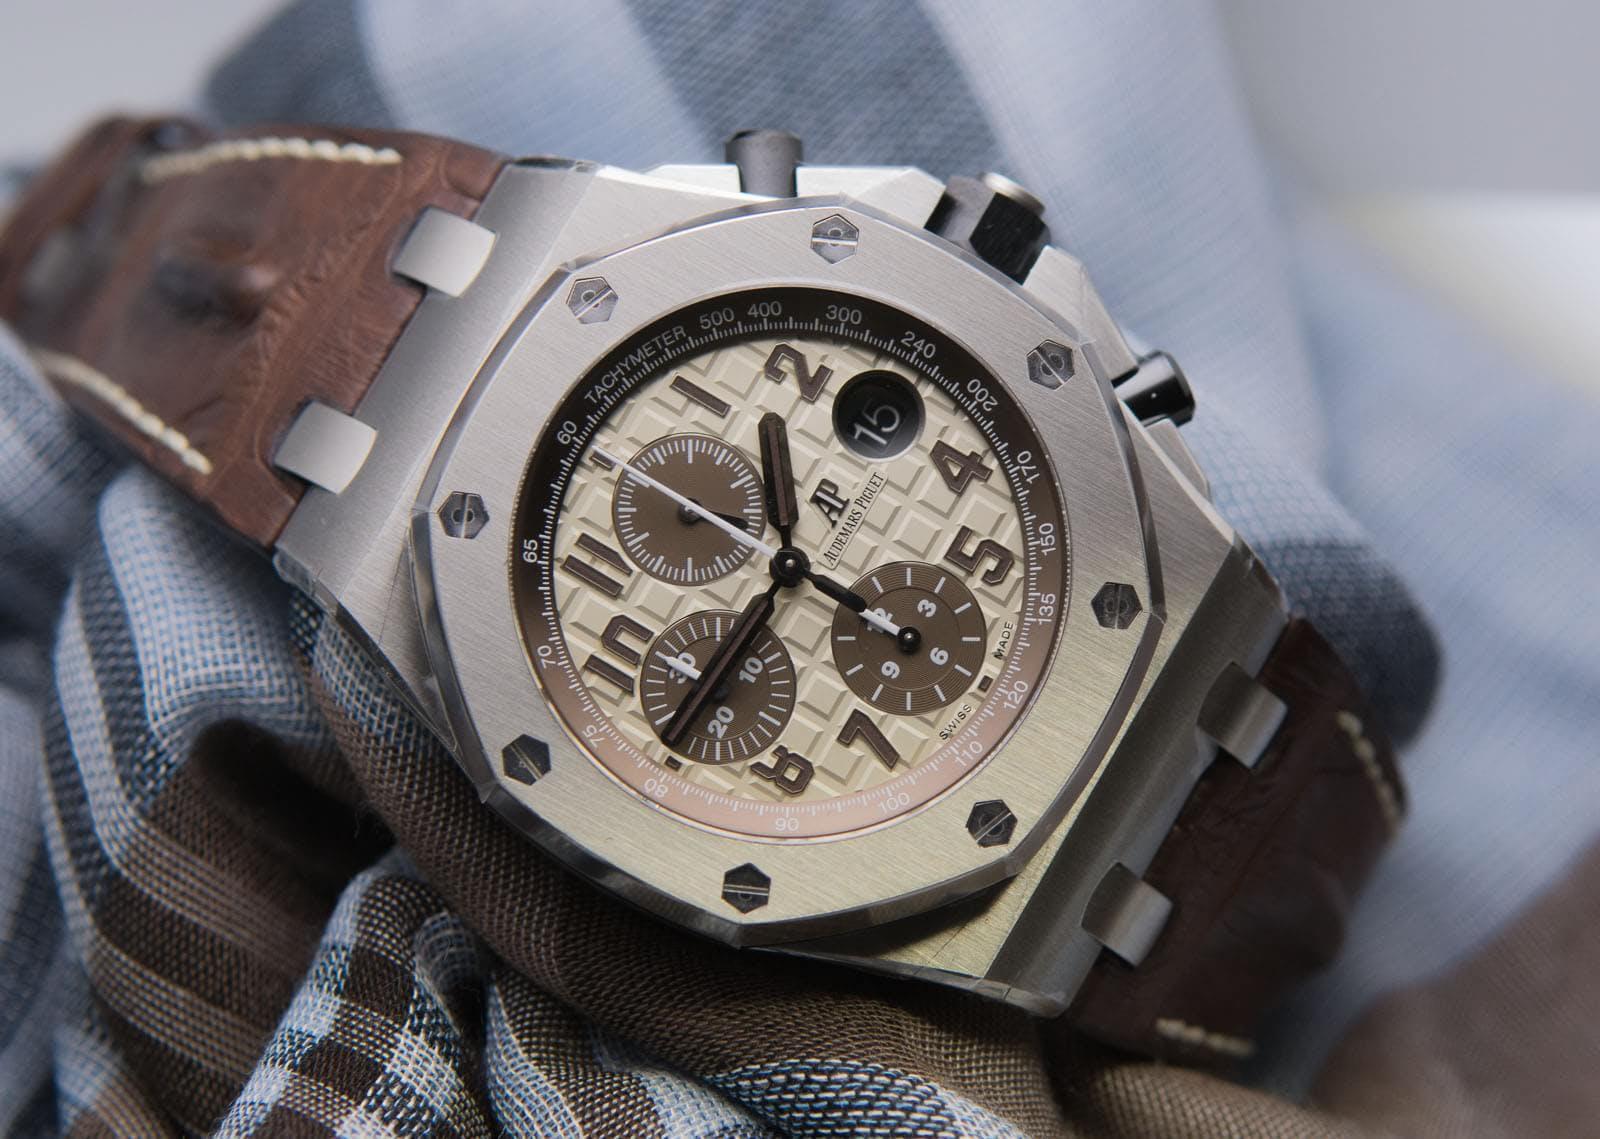 Legendary watches audemars piguet royal oak for Royal oak offshore n7243